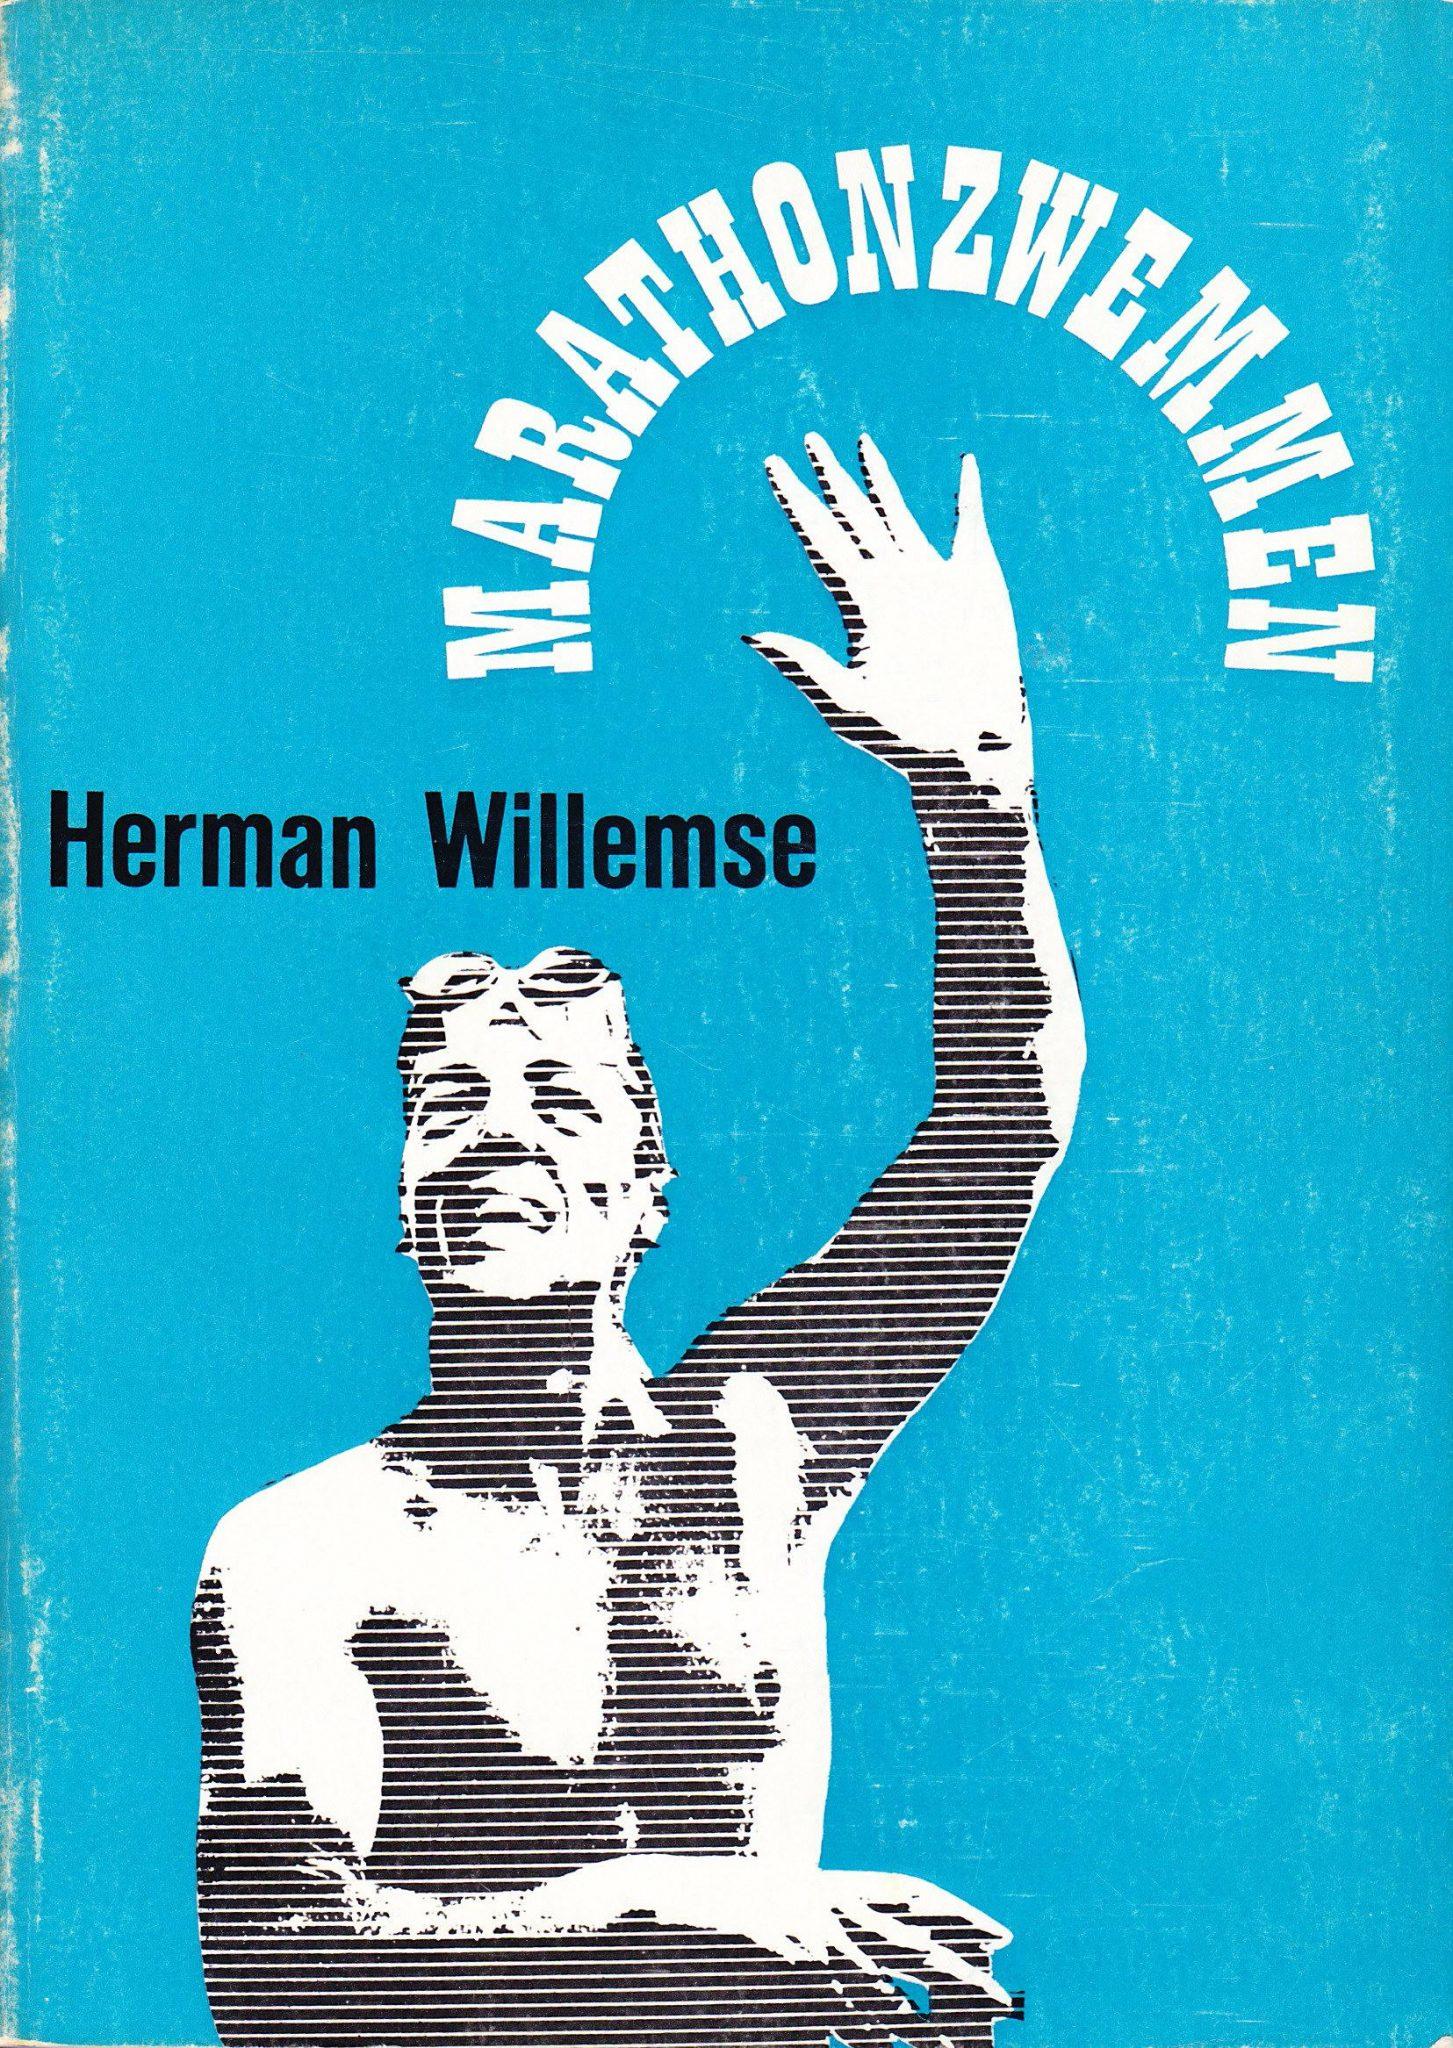 marathonzwemmen � herman willemse en herman kuiphof 1970